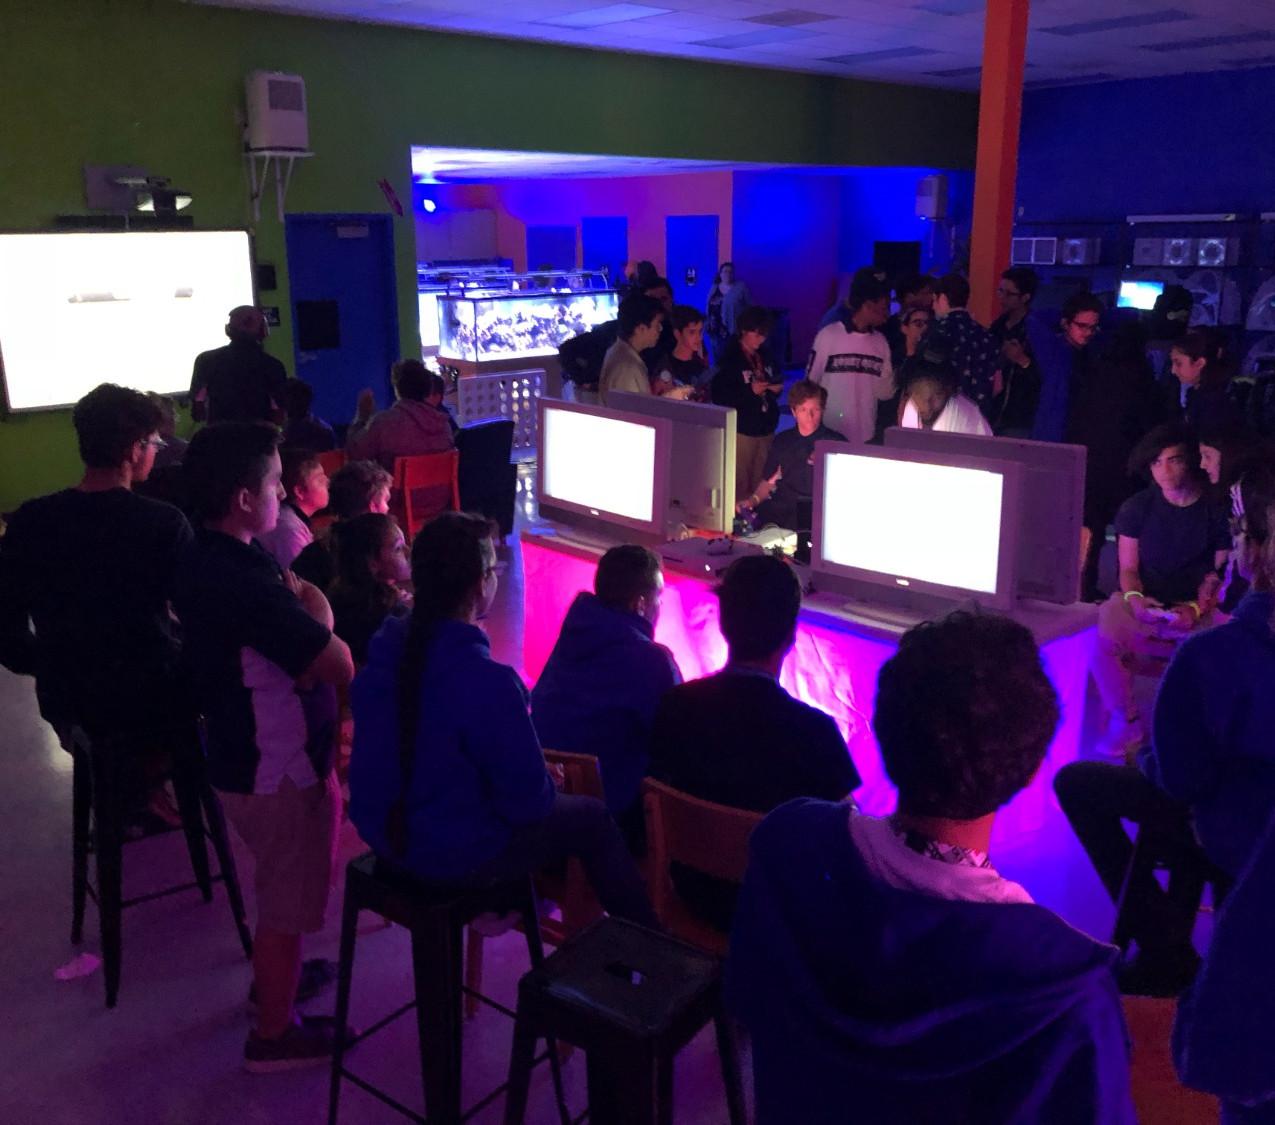 Fortnite Parties - Video Game Truck - Fort Lauderdale 786-423-8759